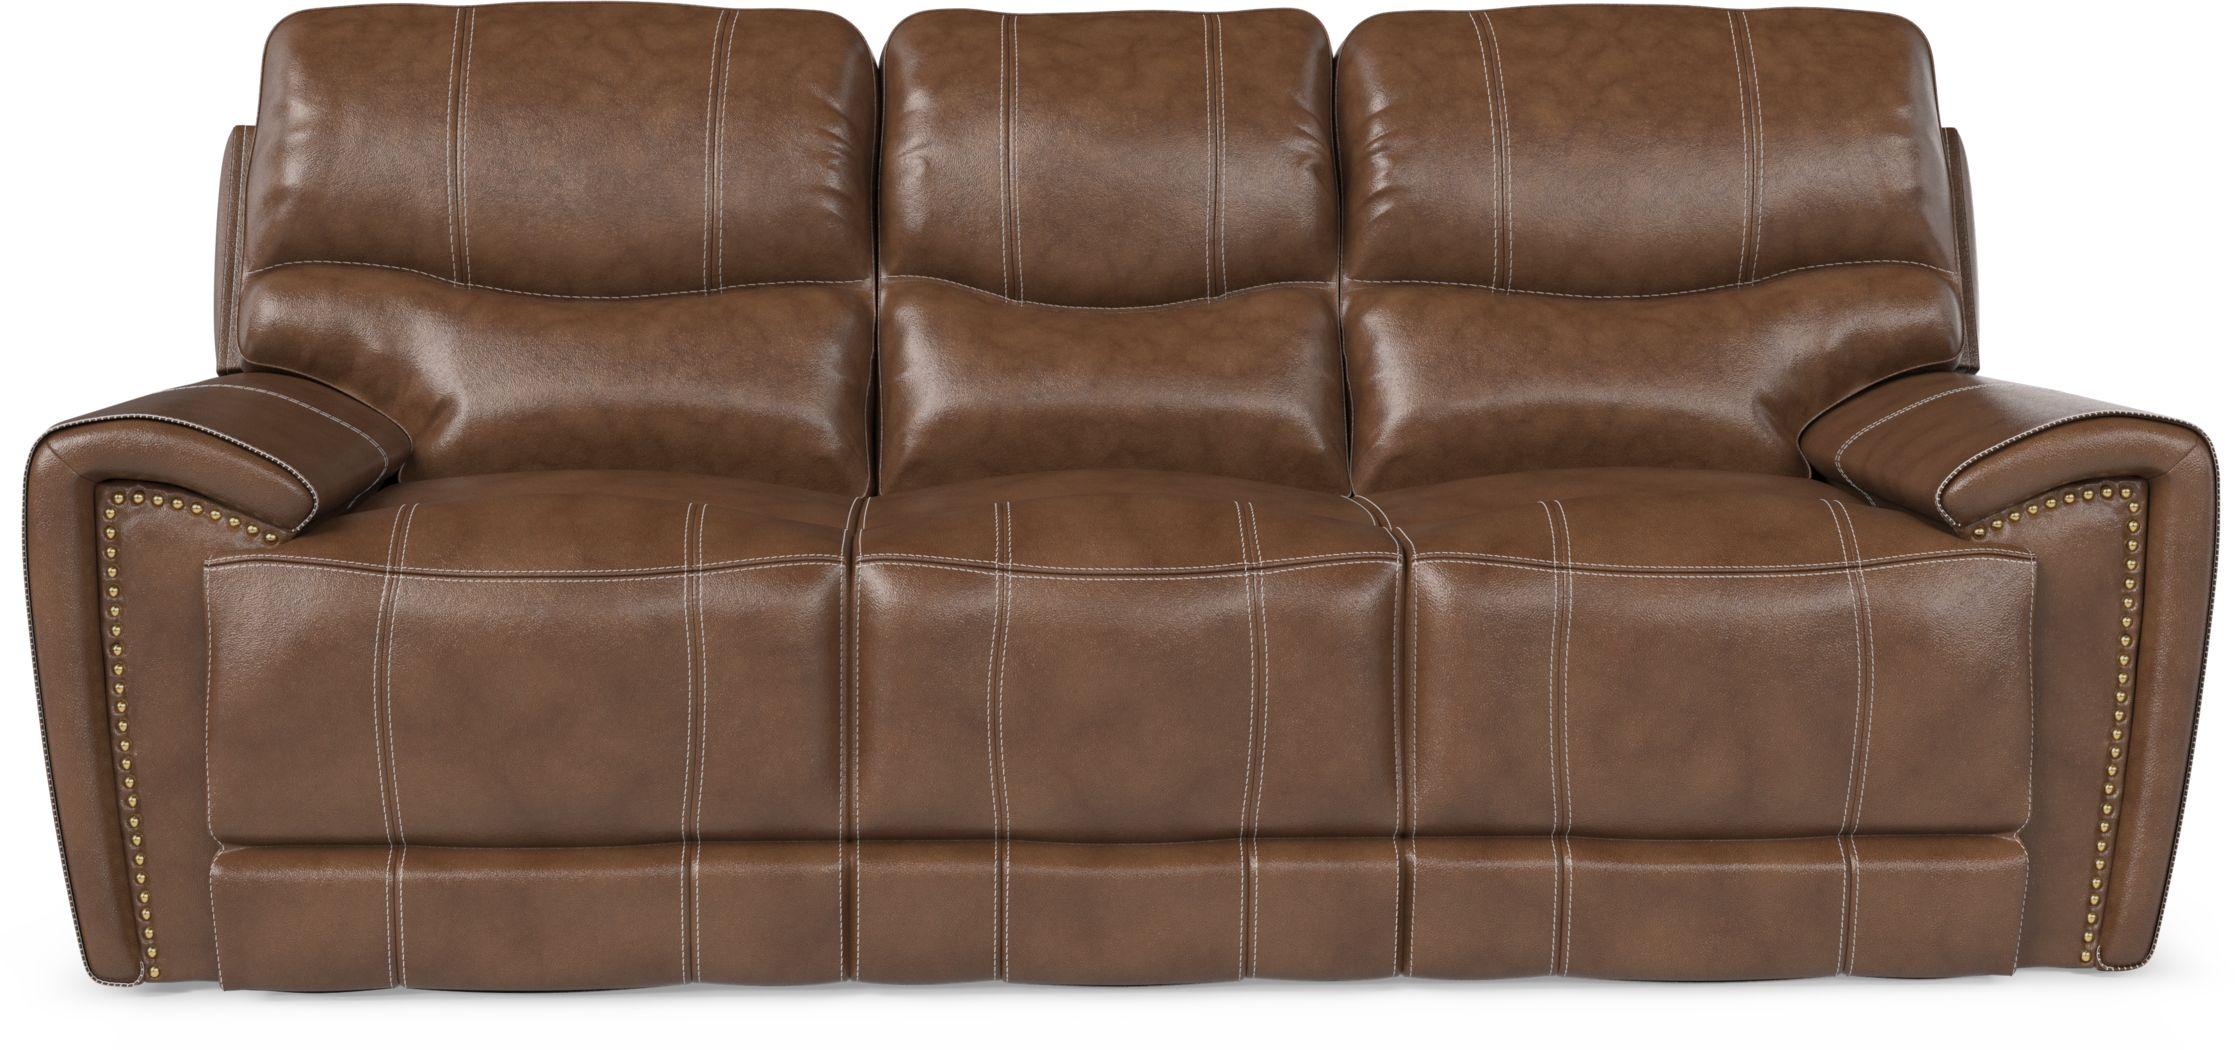 Italo Brown Leather Reclining Sofa